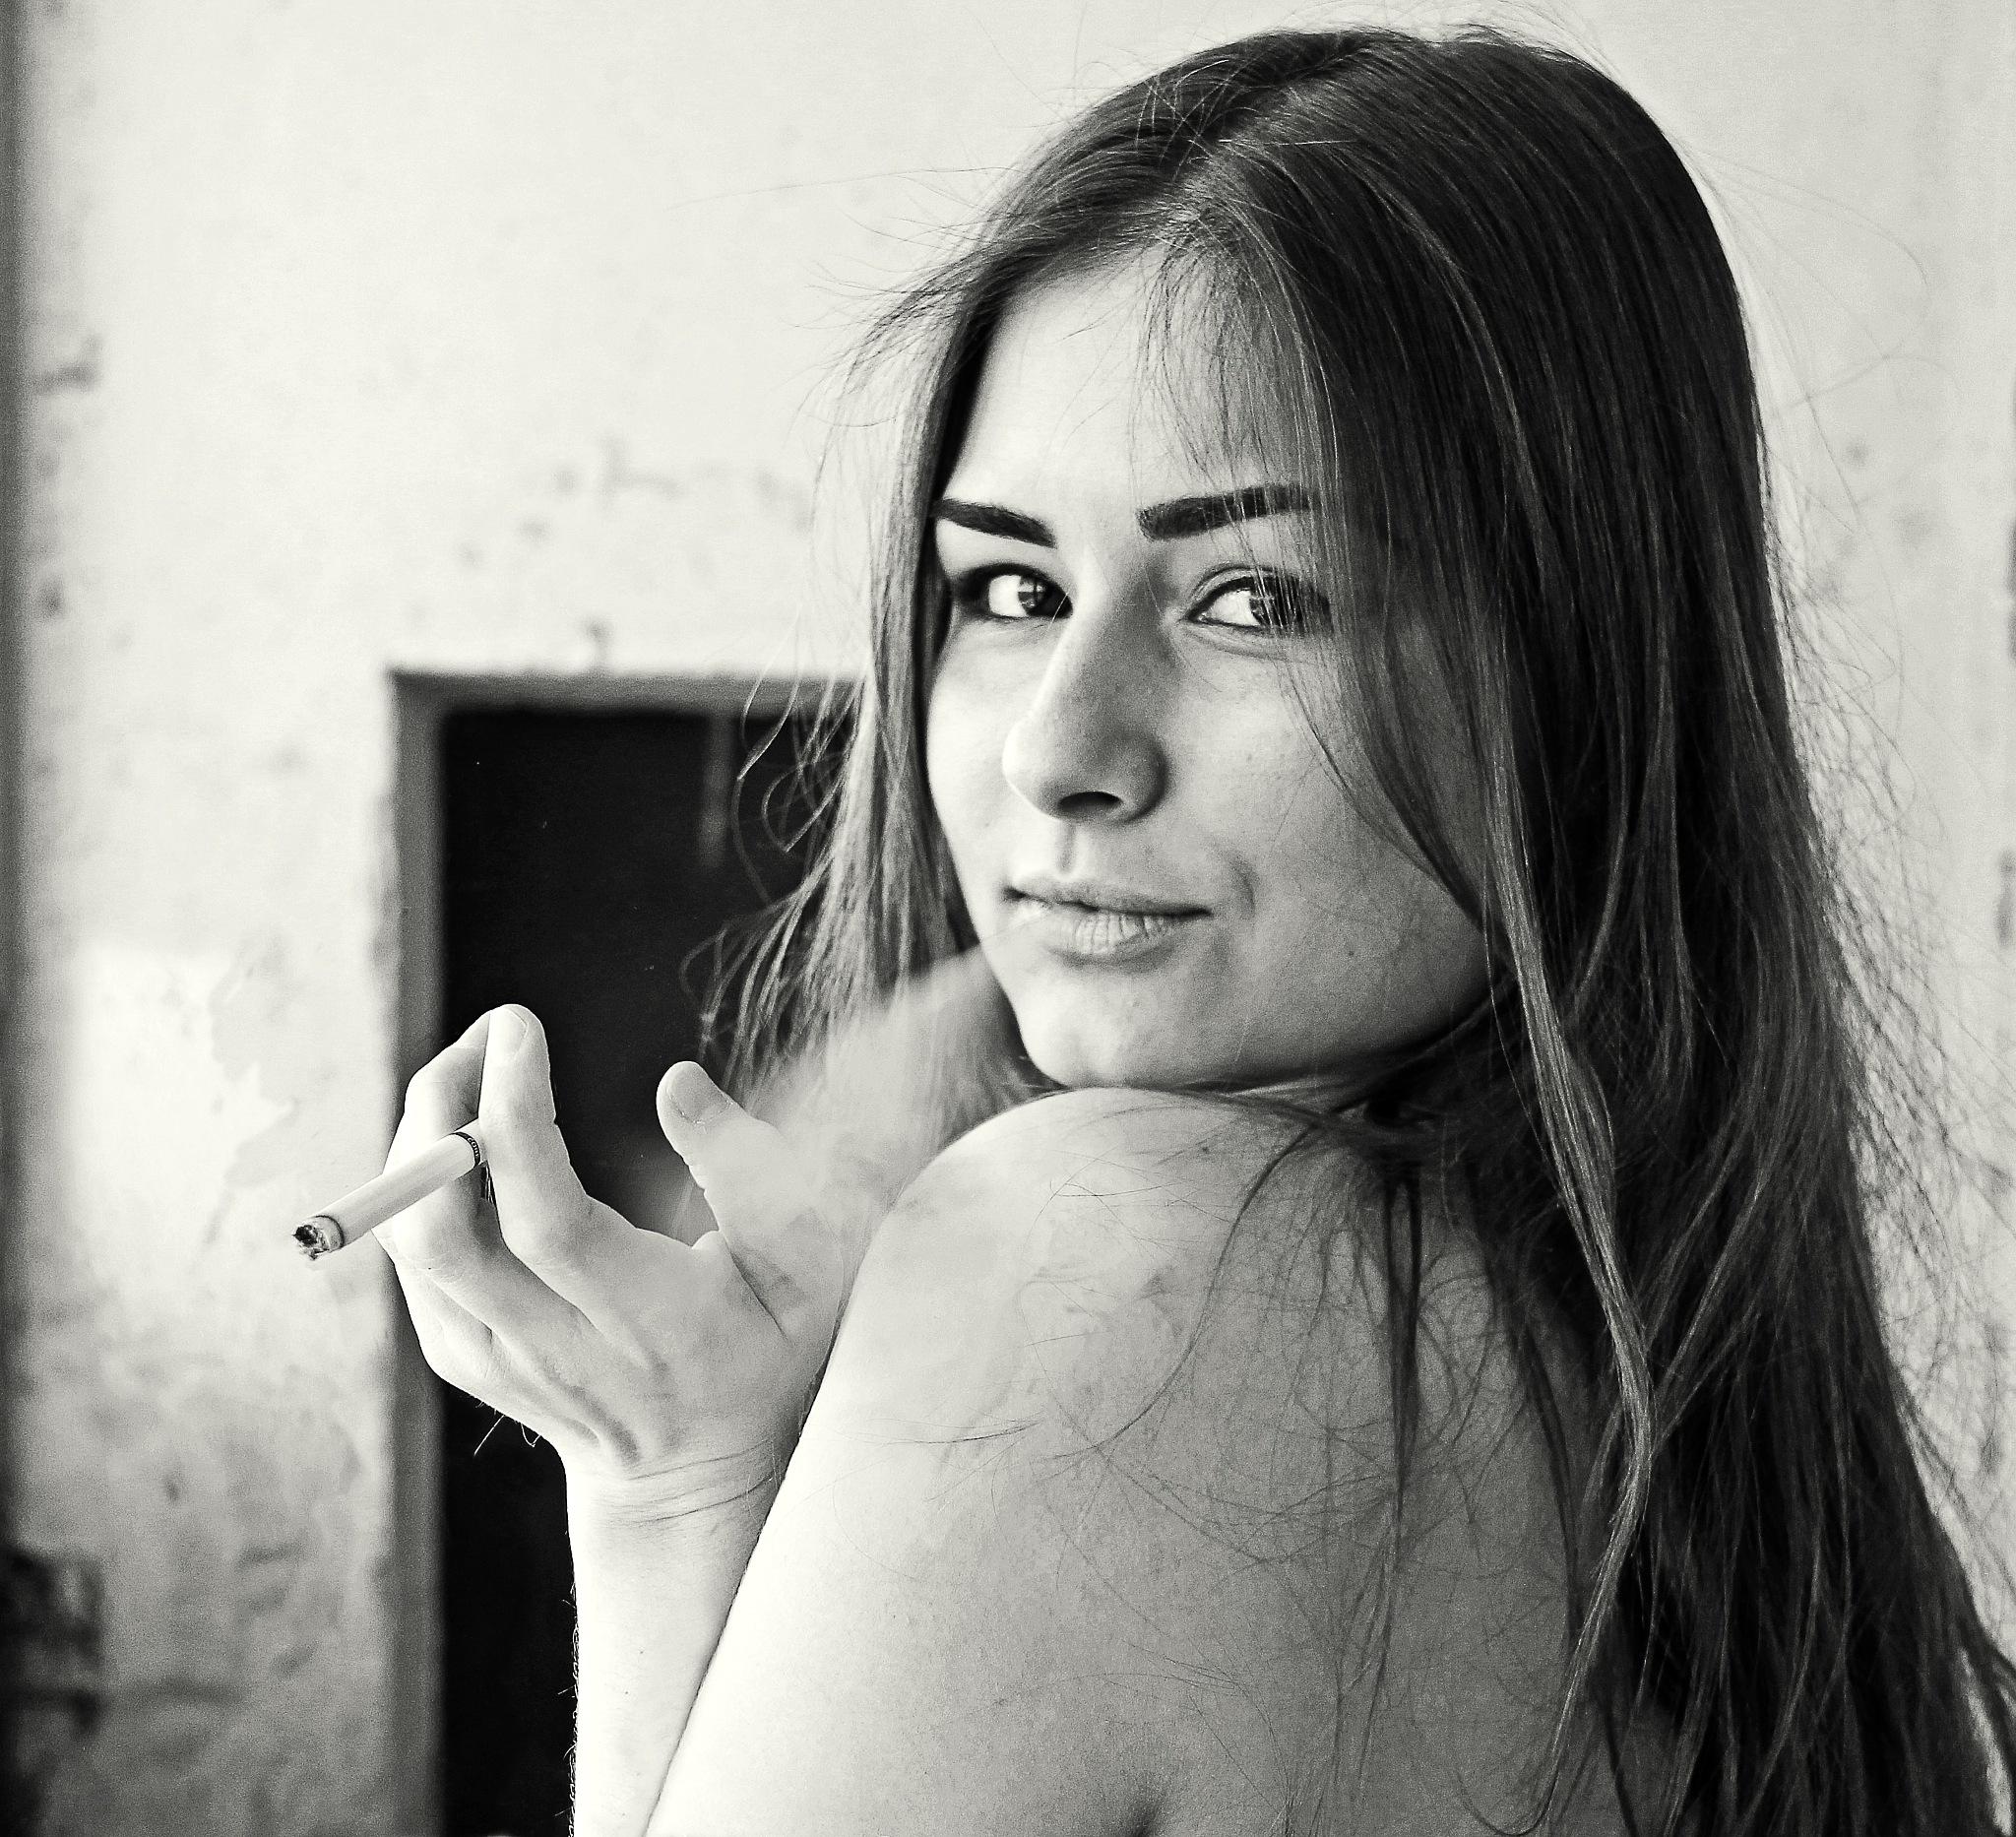 Yulija by Сергей Юрьев